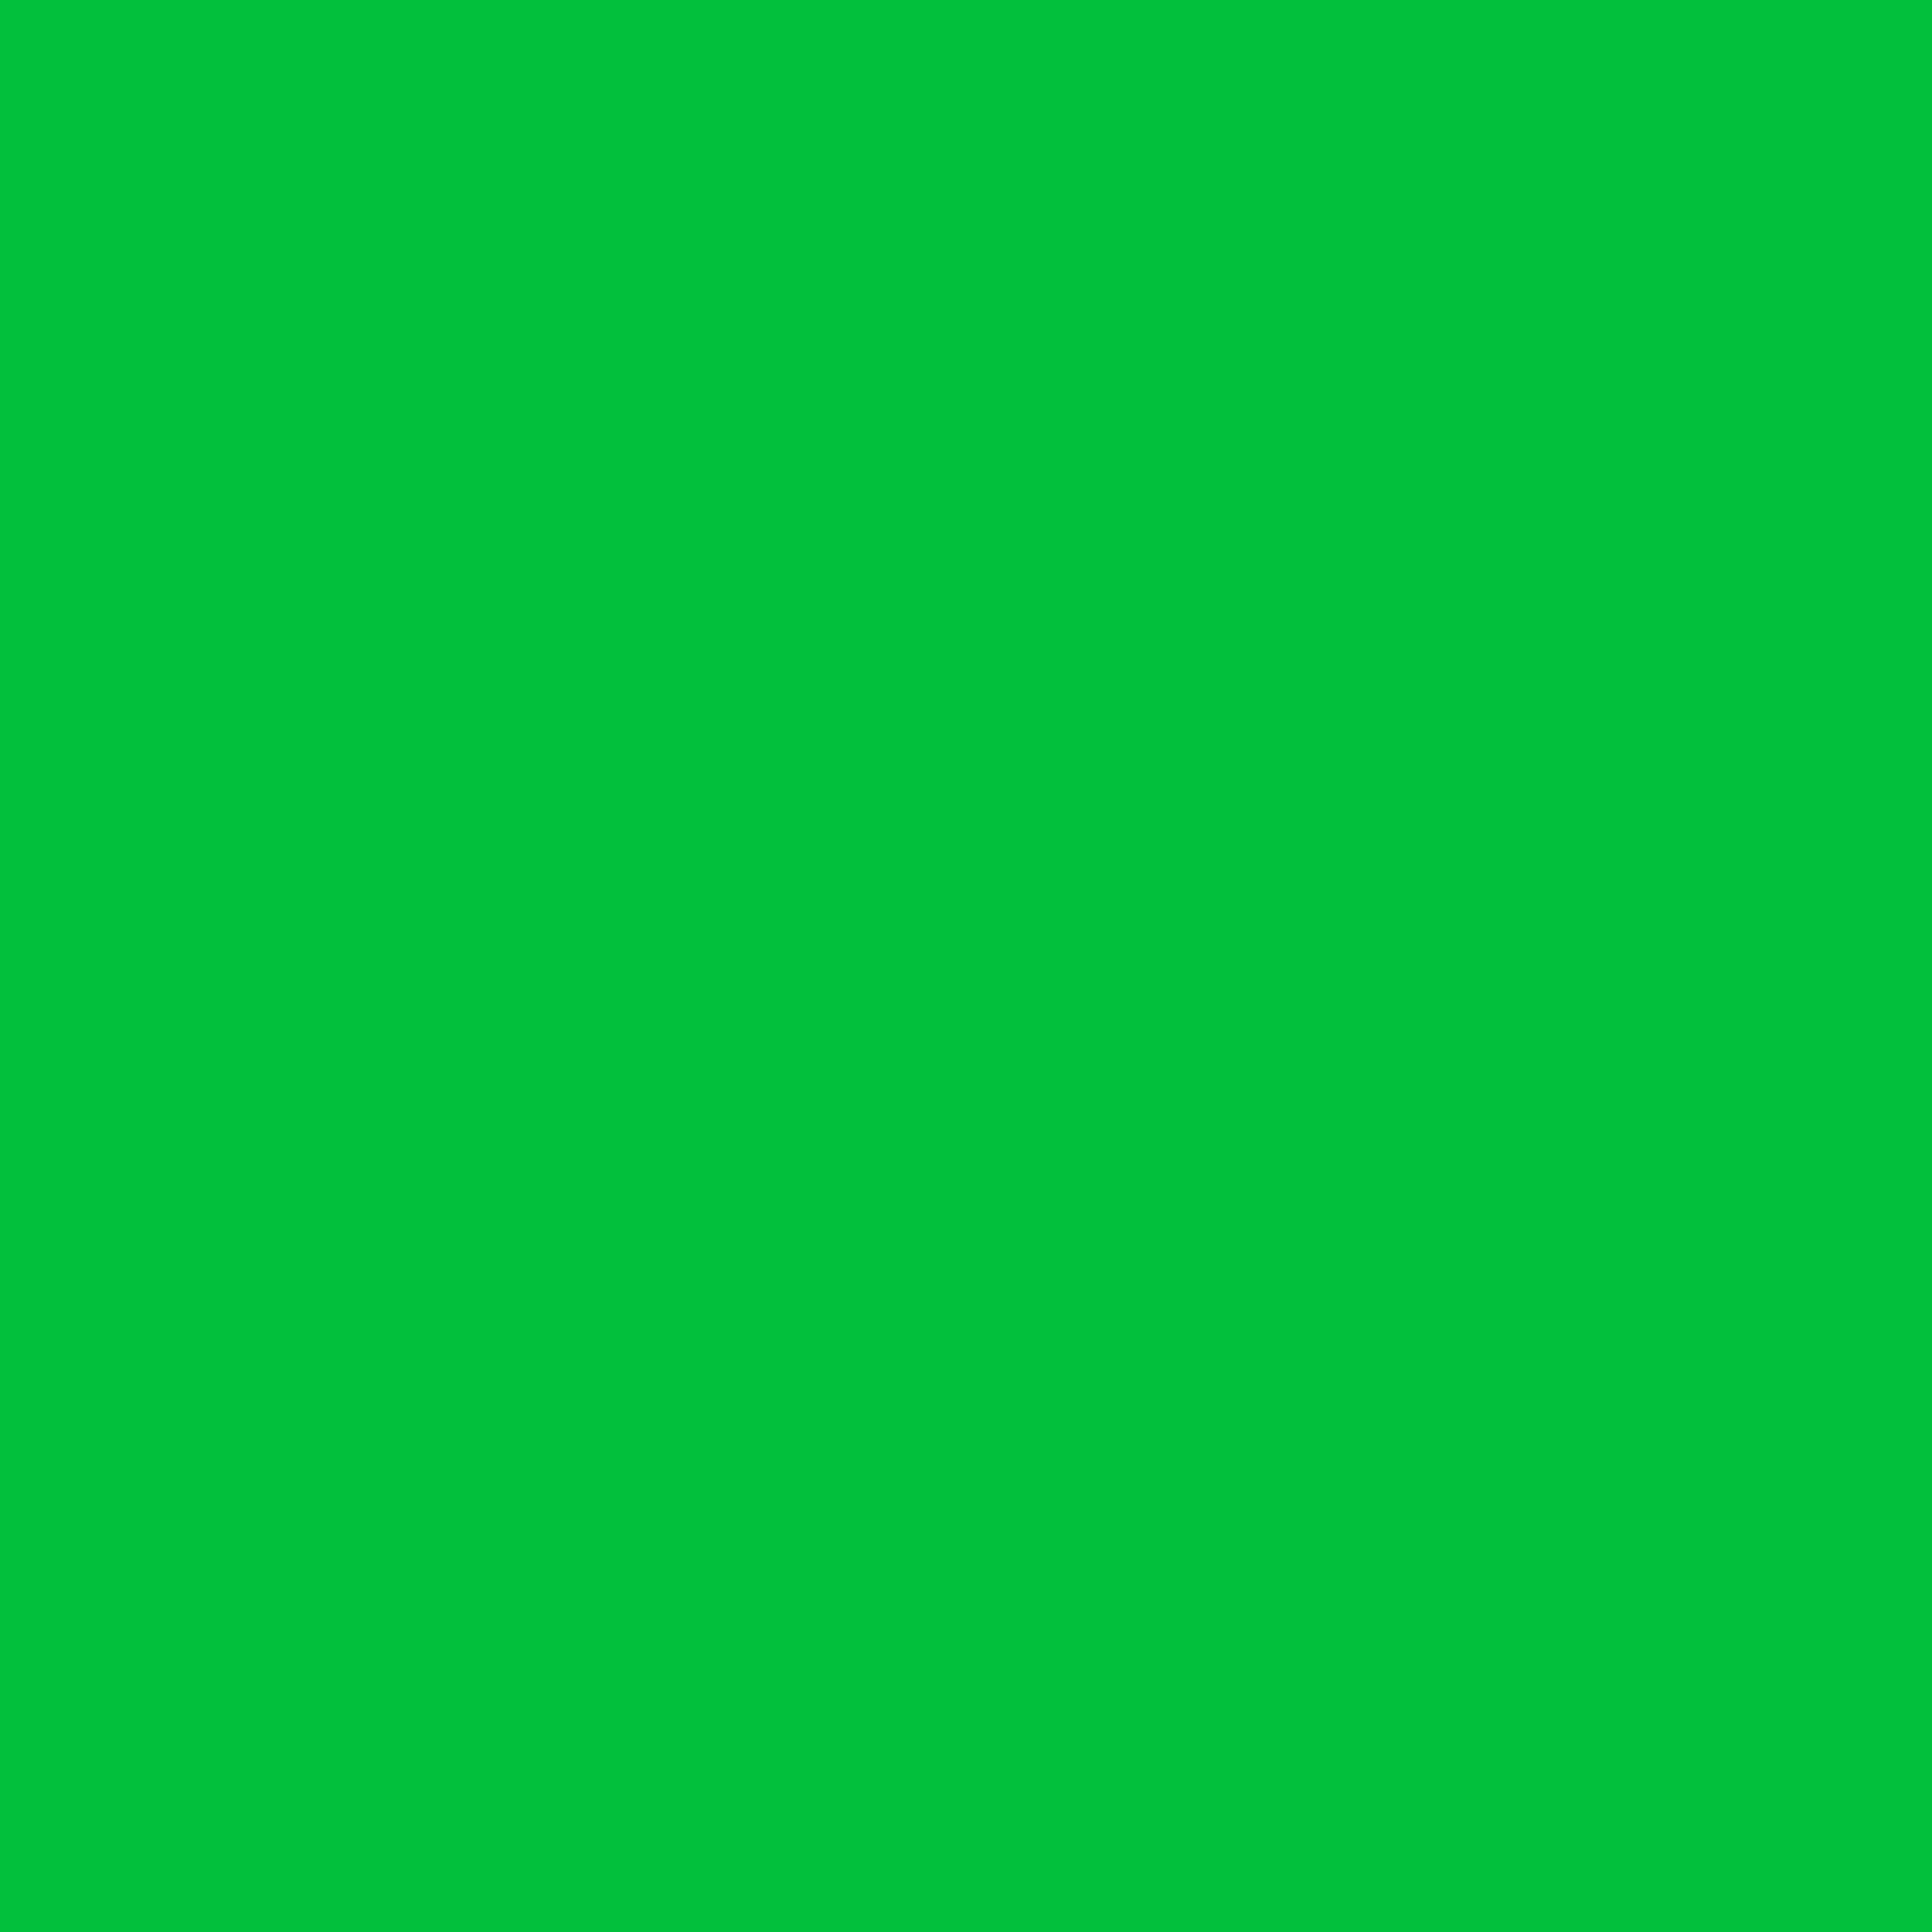 3600x3600 Dark Pastel Green Solid Color Background